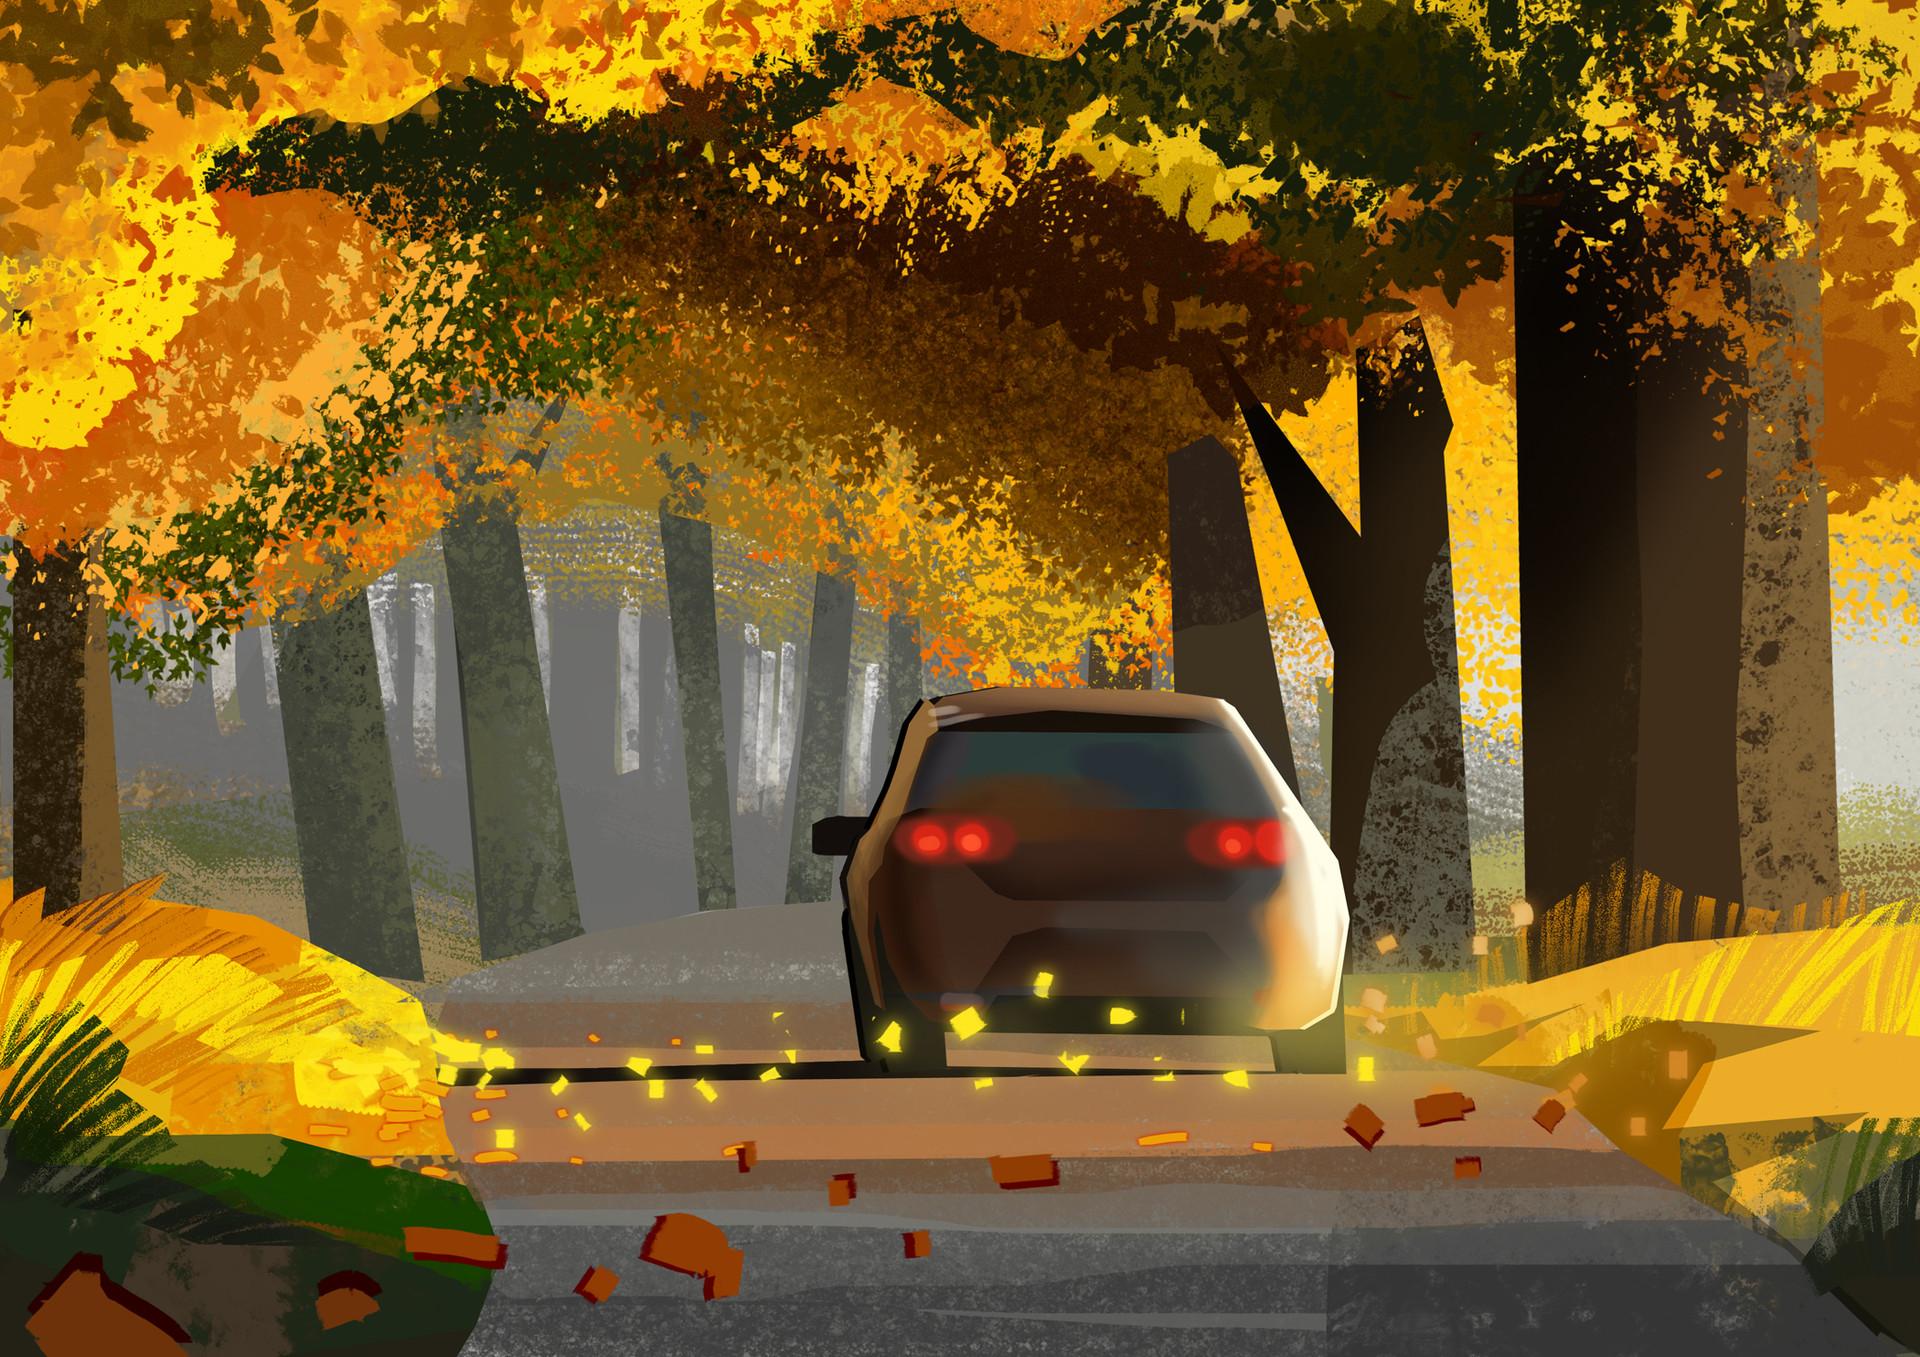 Harald ardeias car autumn sketc h